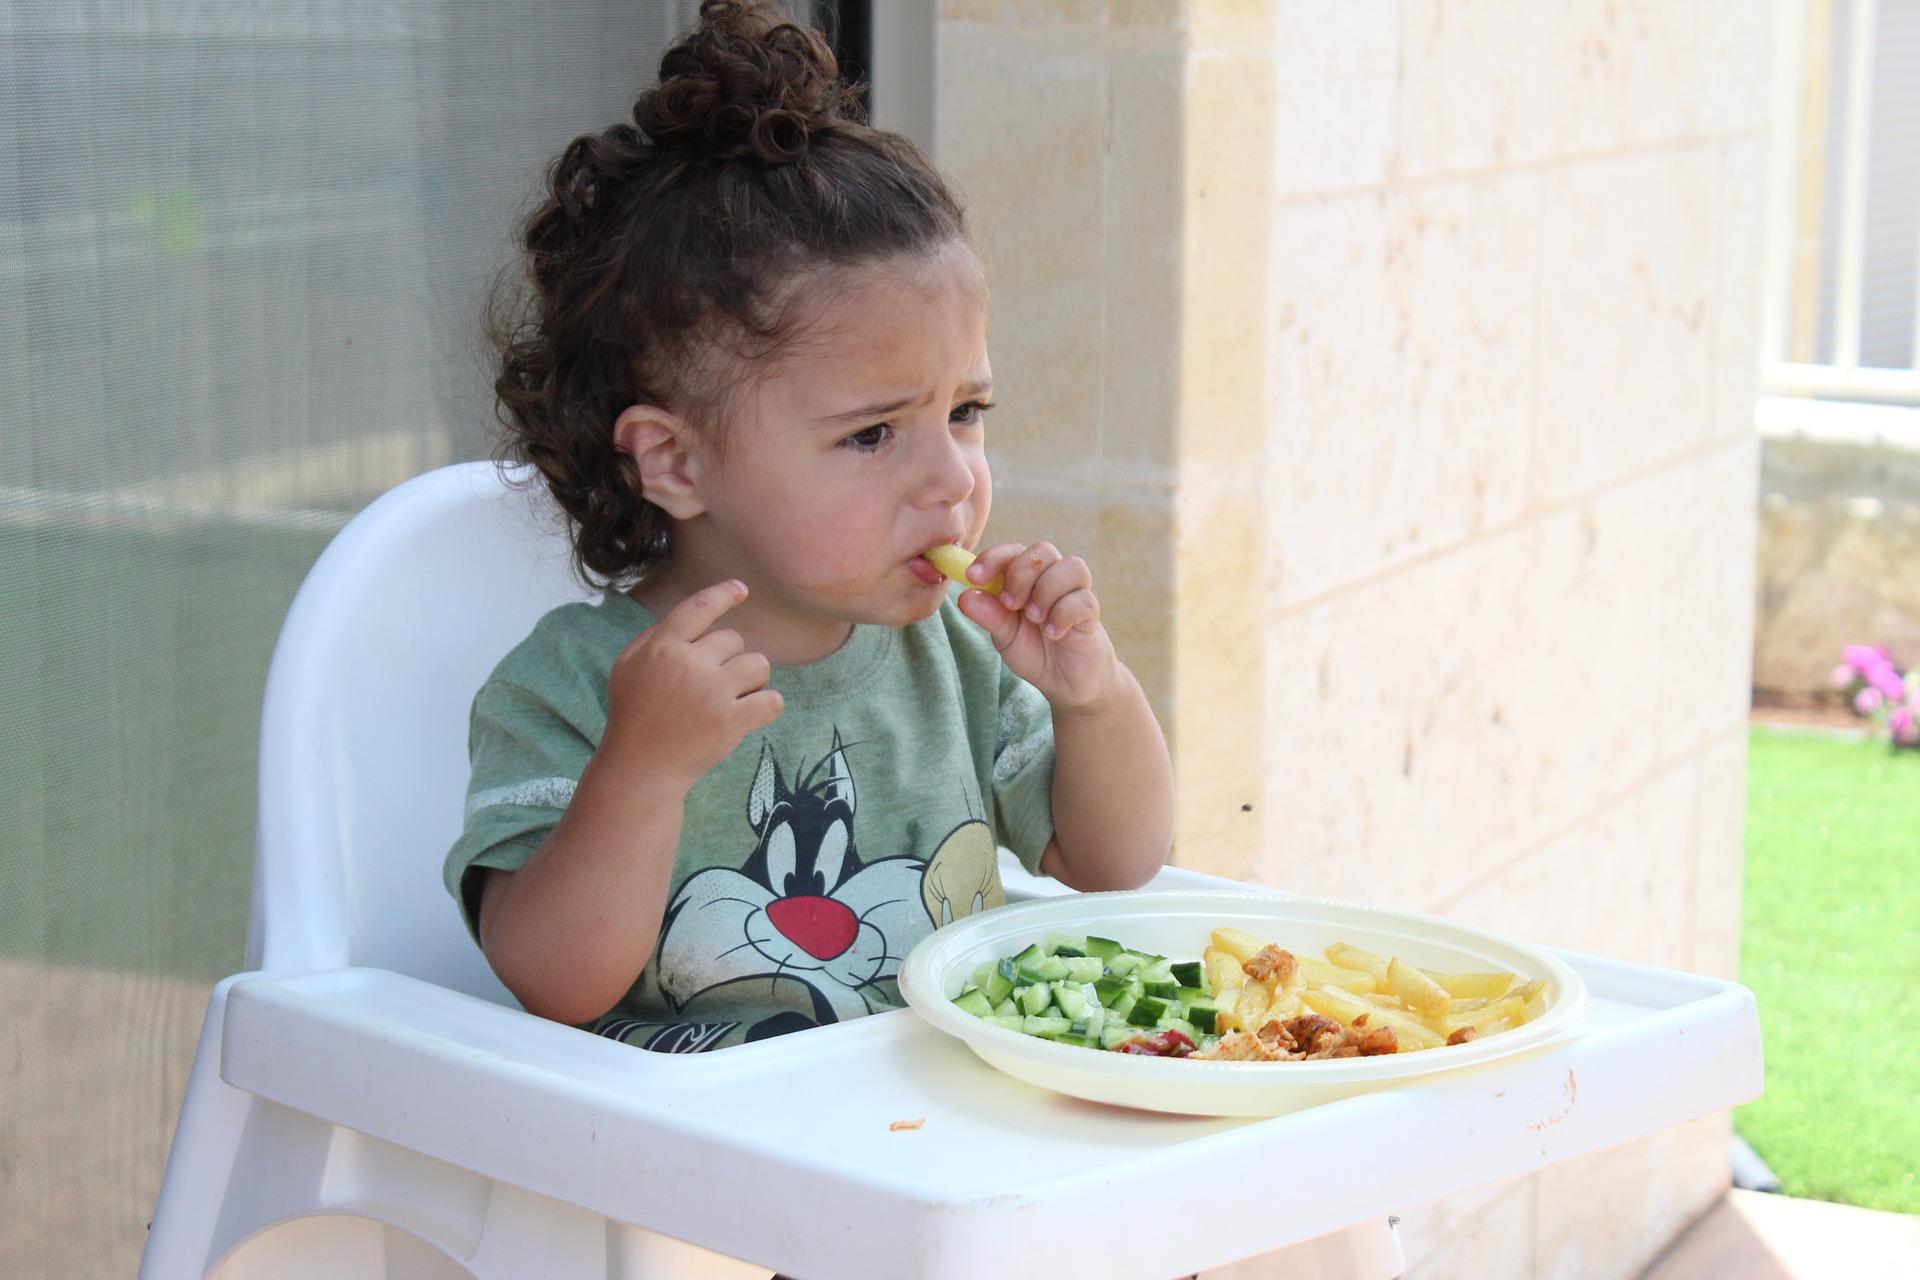 Brak apetytu u dziecka